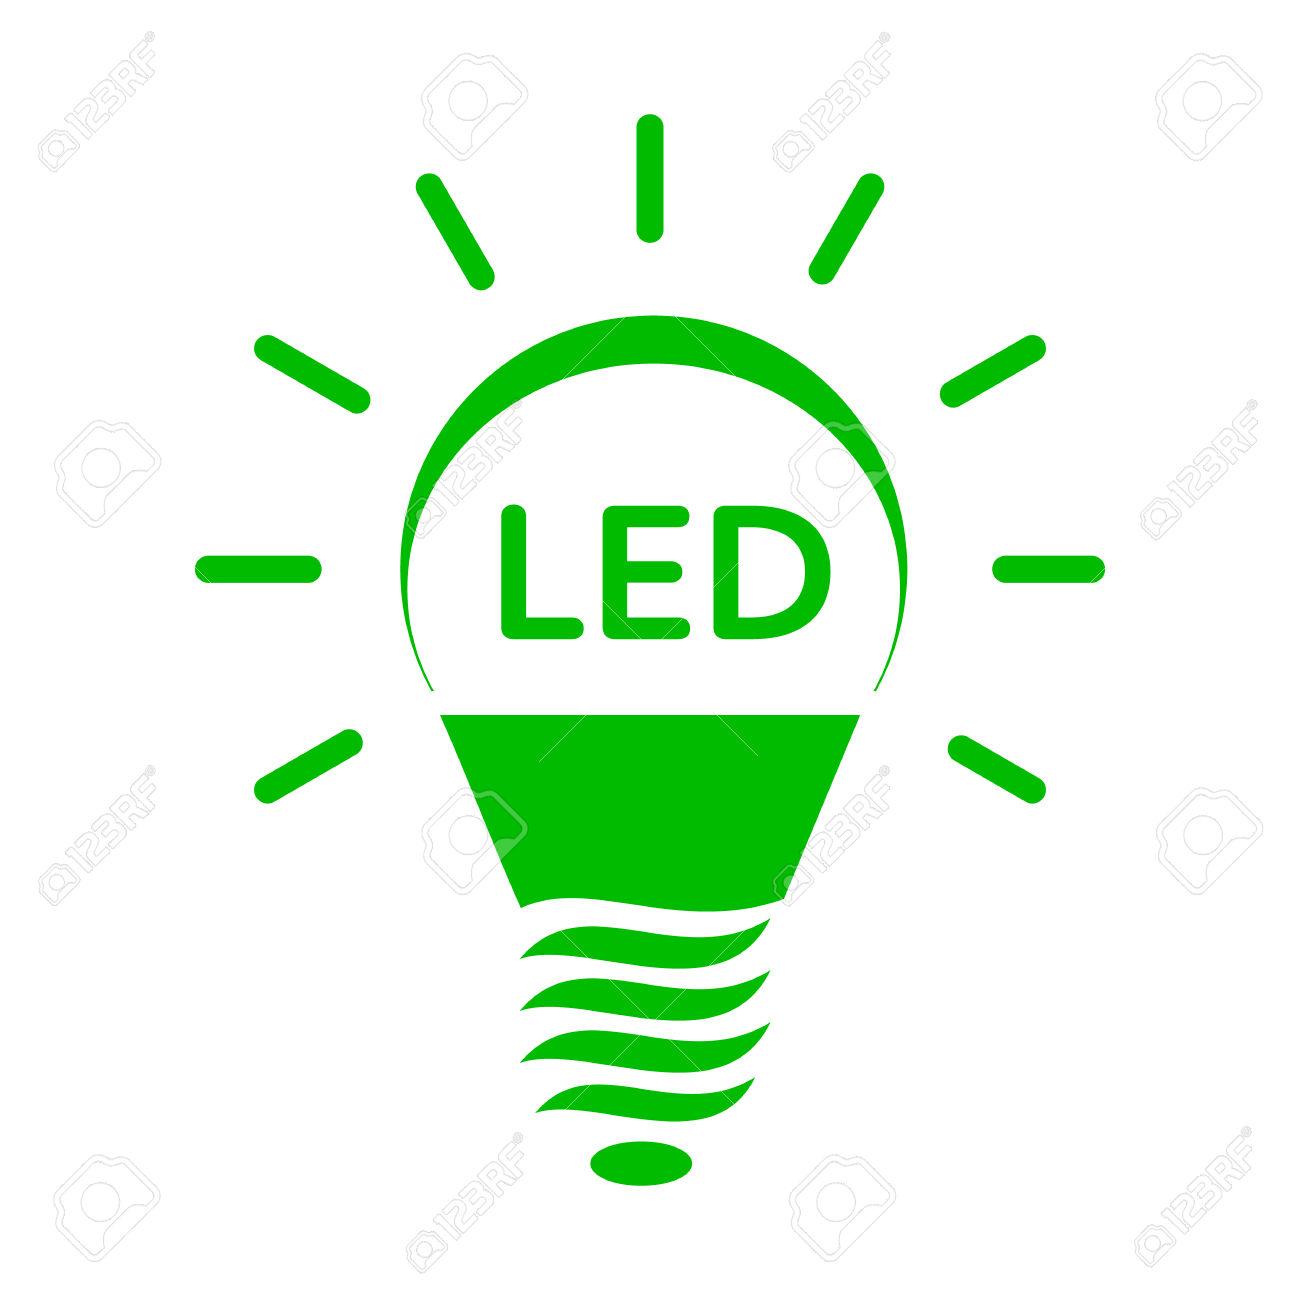 Charmant Led Symbole Ideen Elektrische Schaltplan Ideen